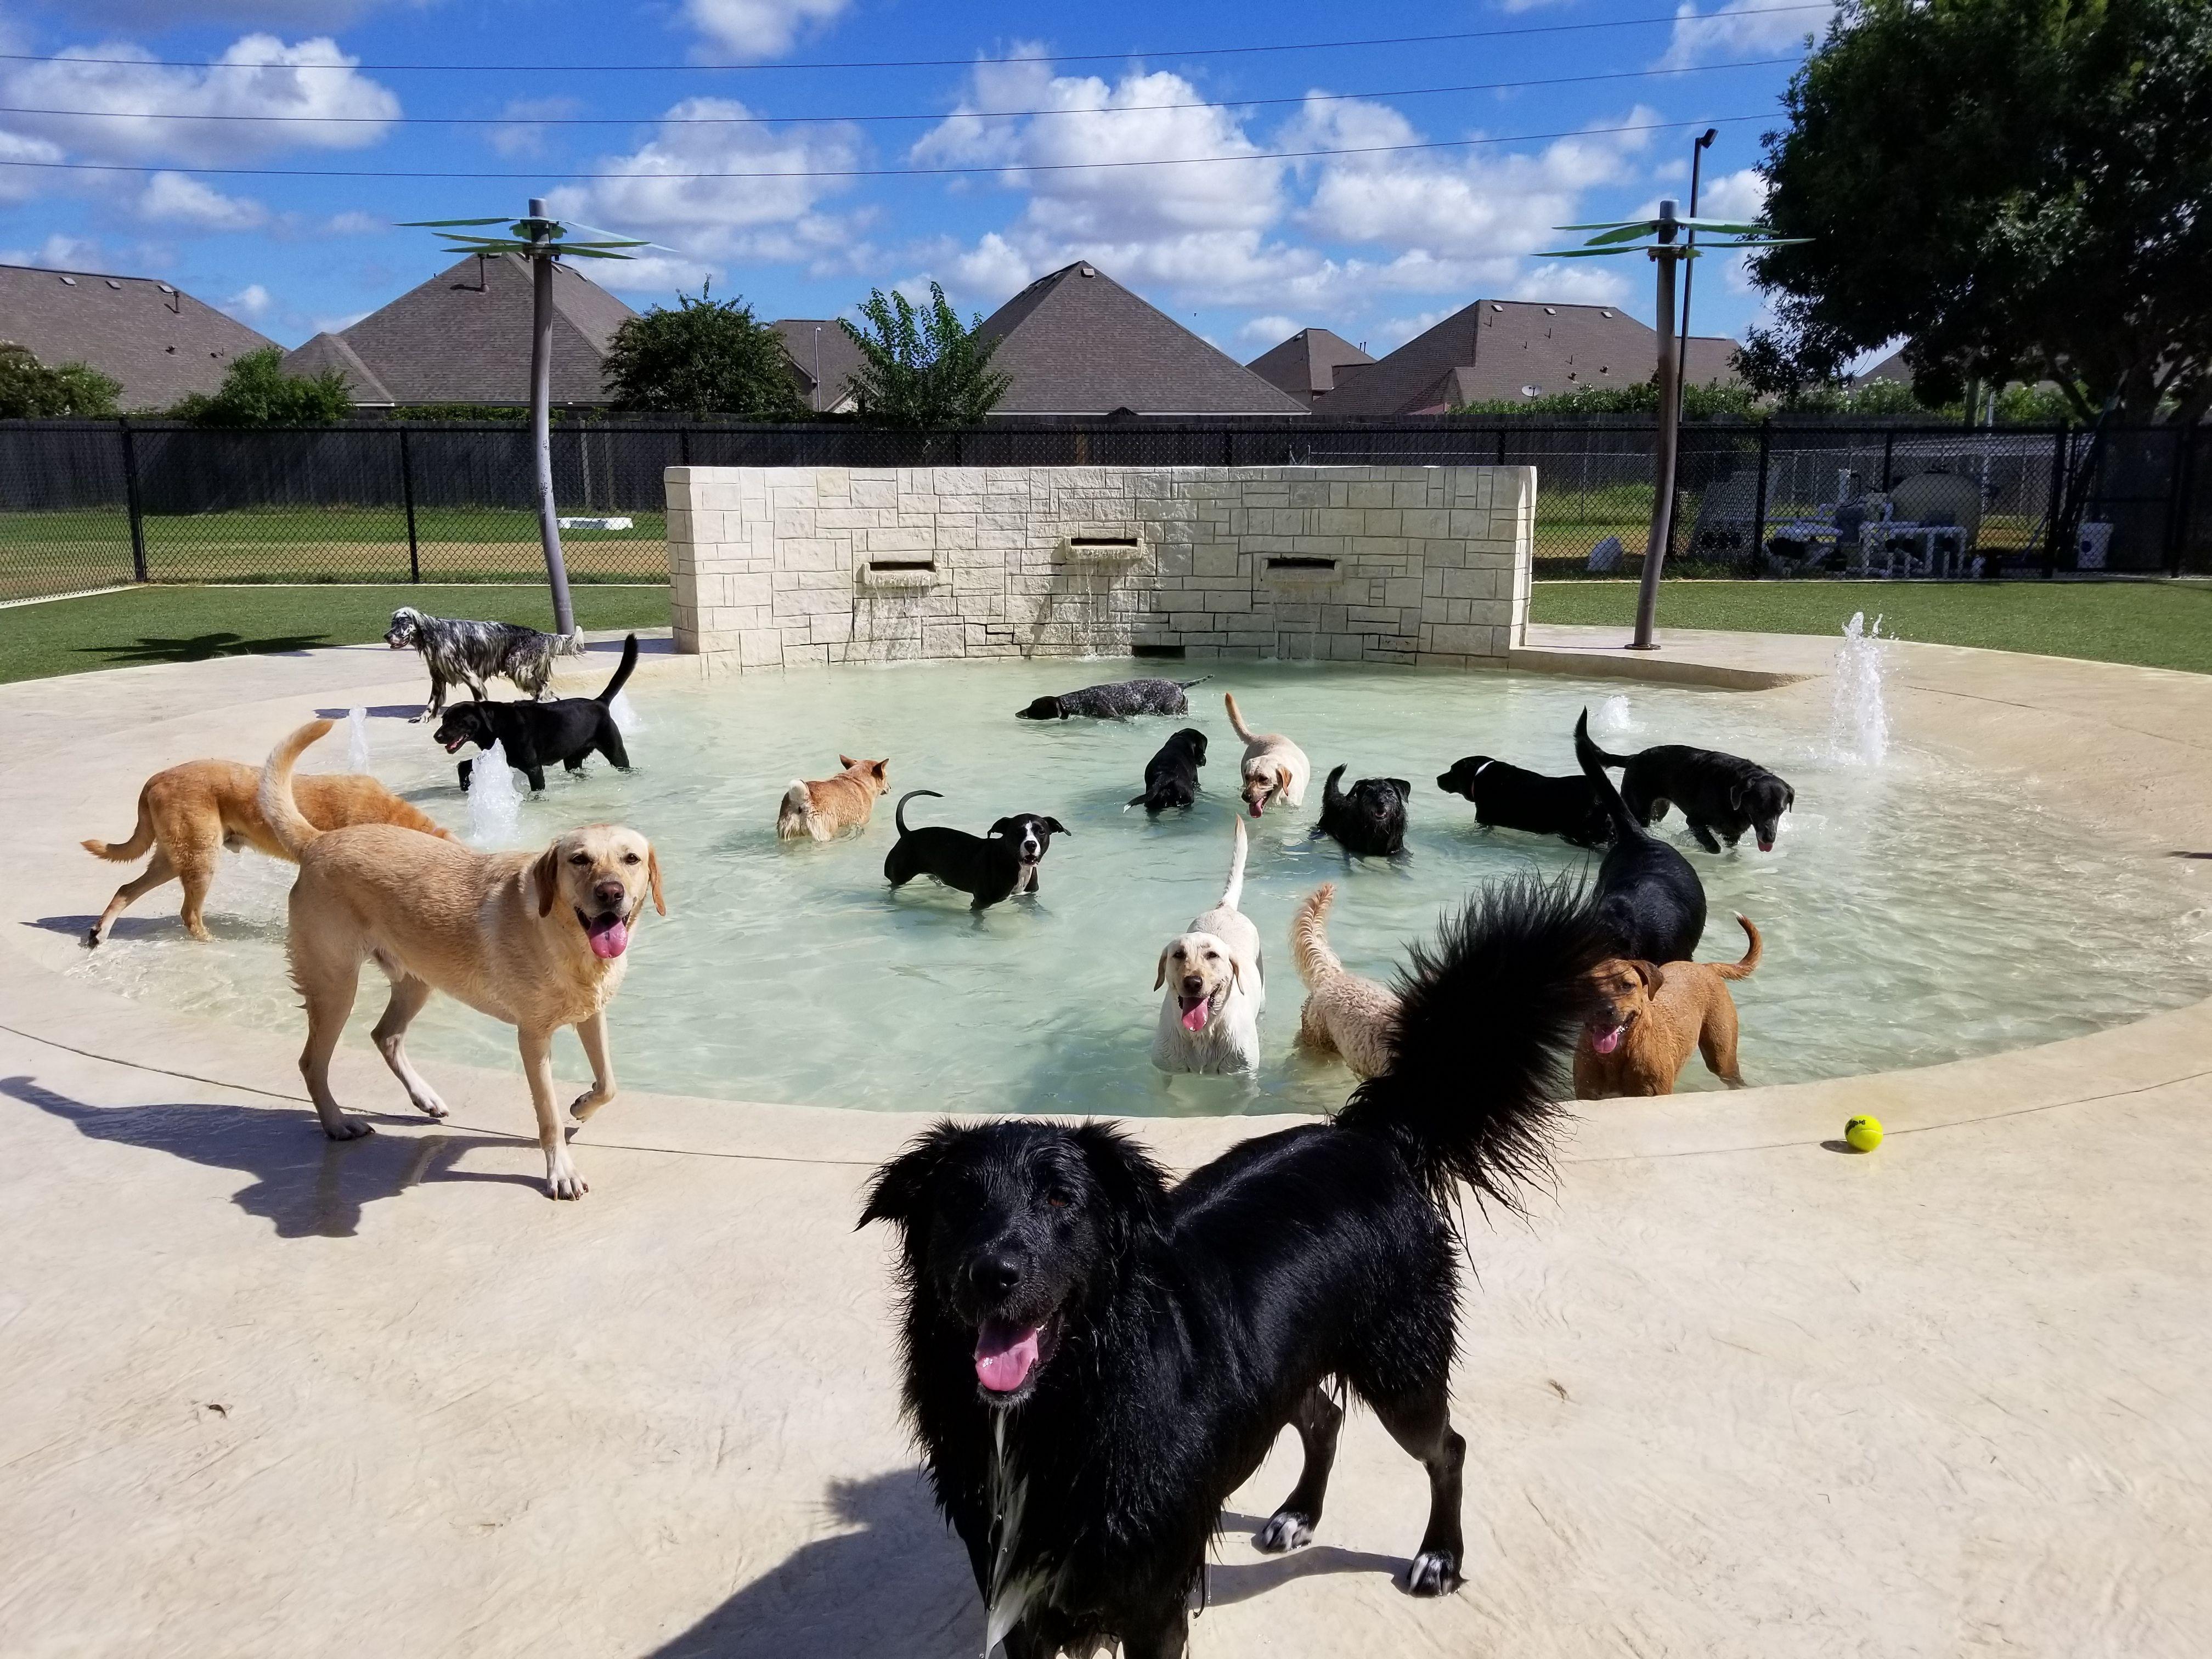 Pet Resorts Luxury Doggie Pool At Rover Oaks Pet Resort In Katy Texas Rover Pet Resort In 2020 Pet Resort Dog Pool Luxury Pet